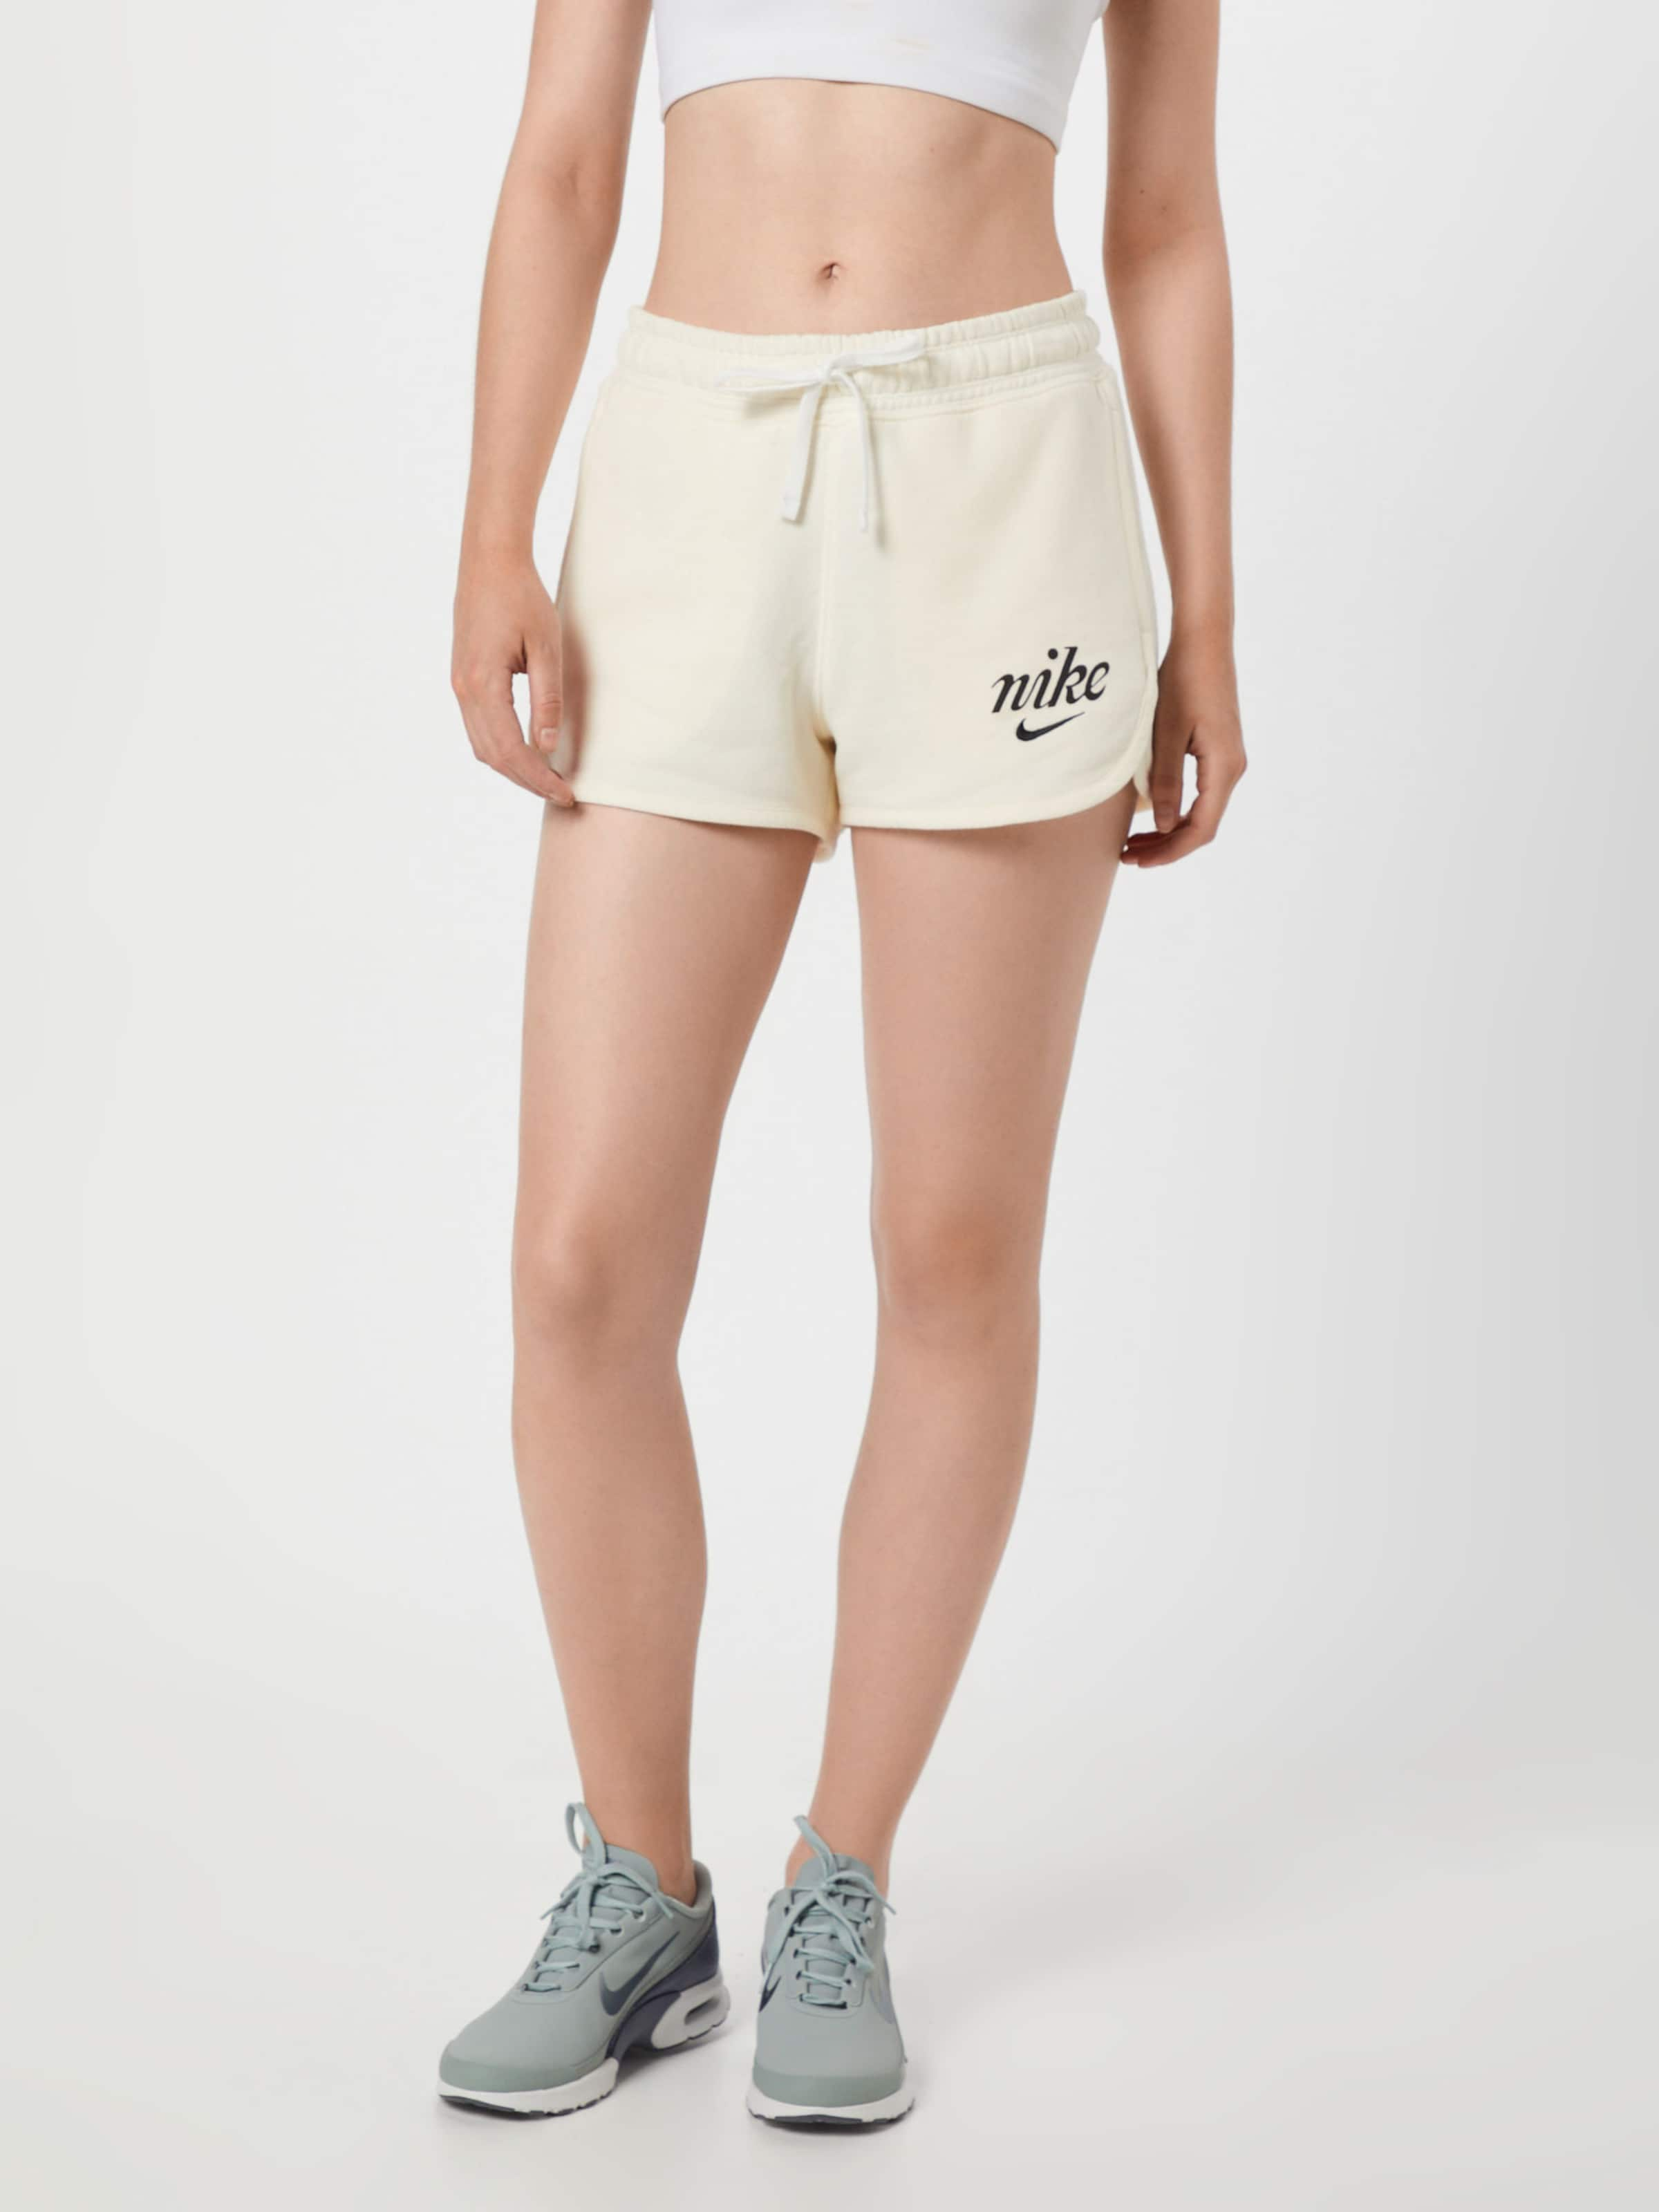 Short Nike Shorts Sportswear Wsh' In Offwhite 'w Nsw 8On0wPkX